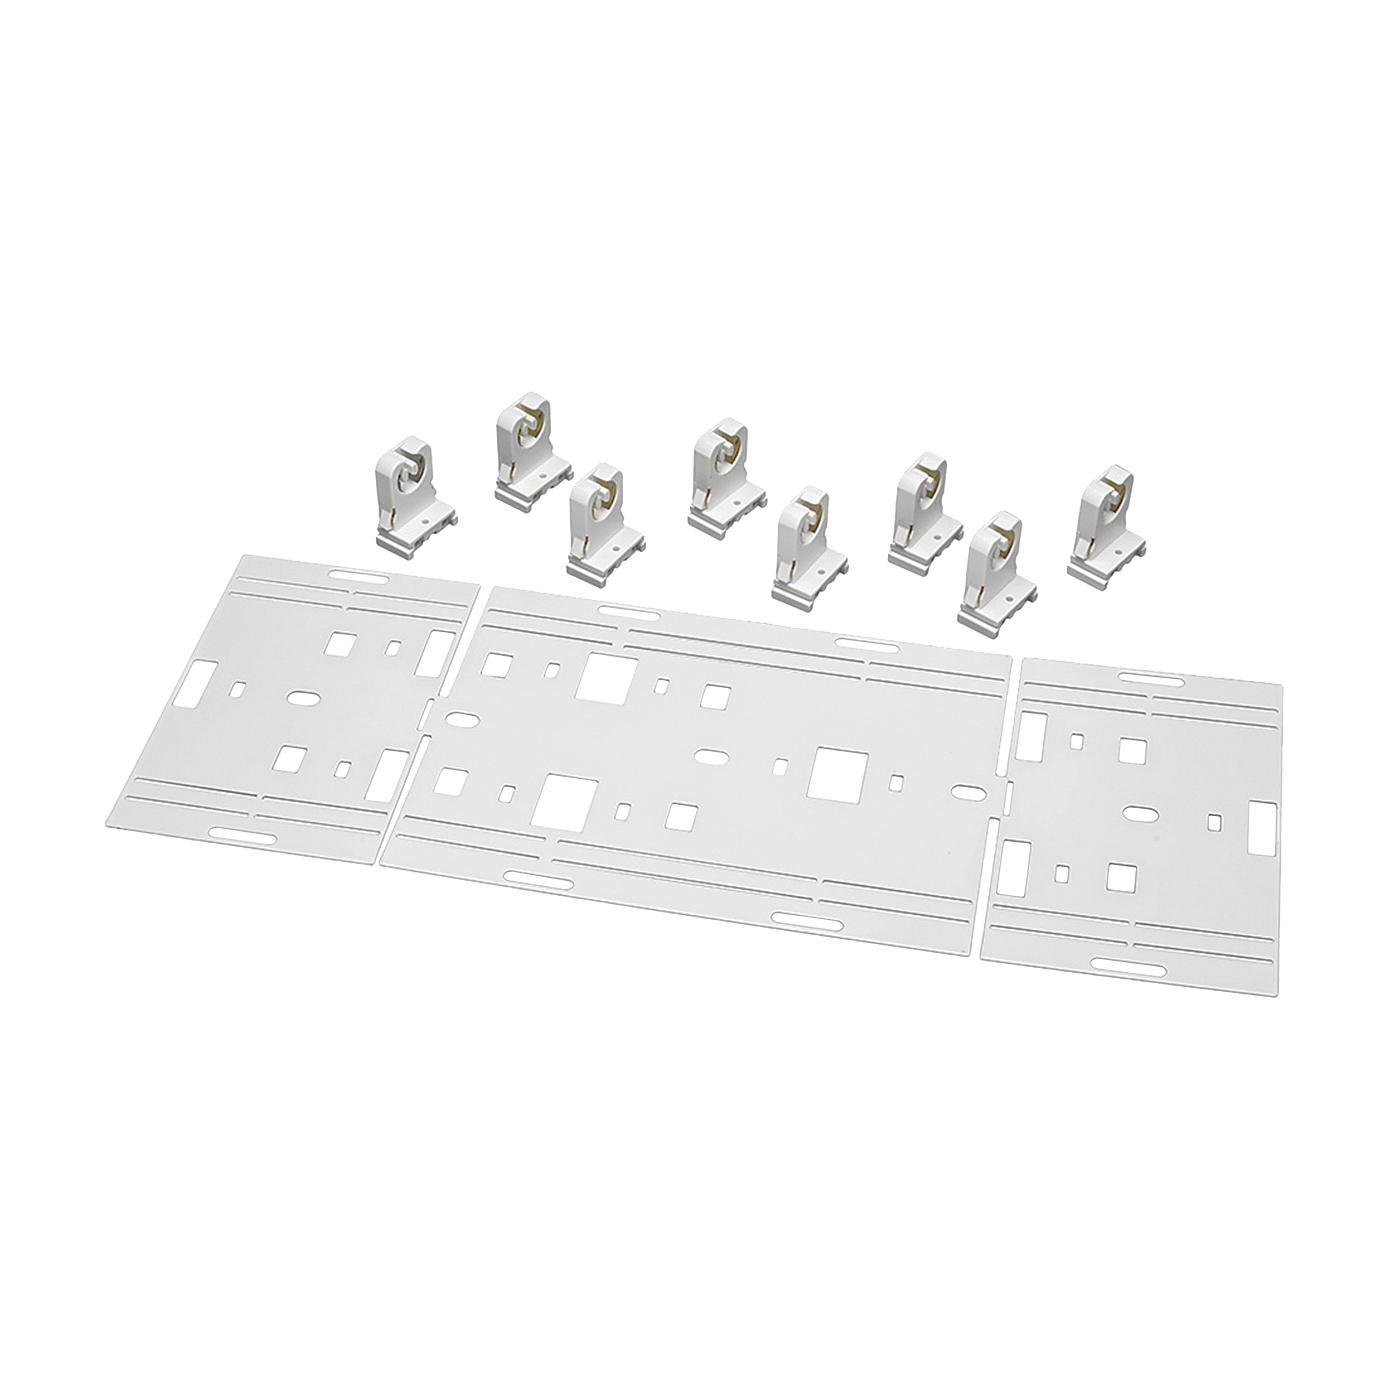 Picture of ETI 54296301 Conversion Kit, Metal, White, 10, Case